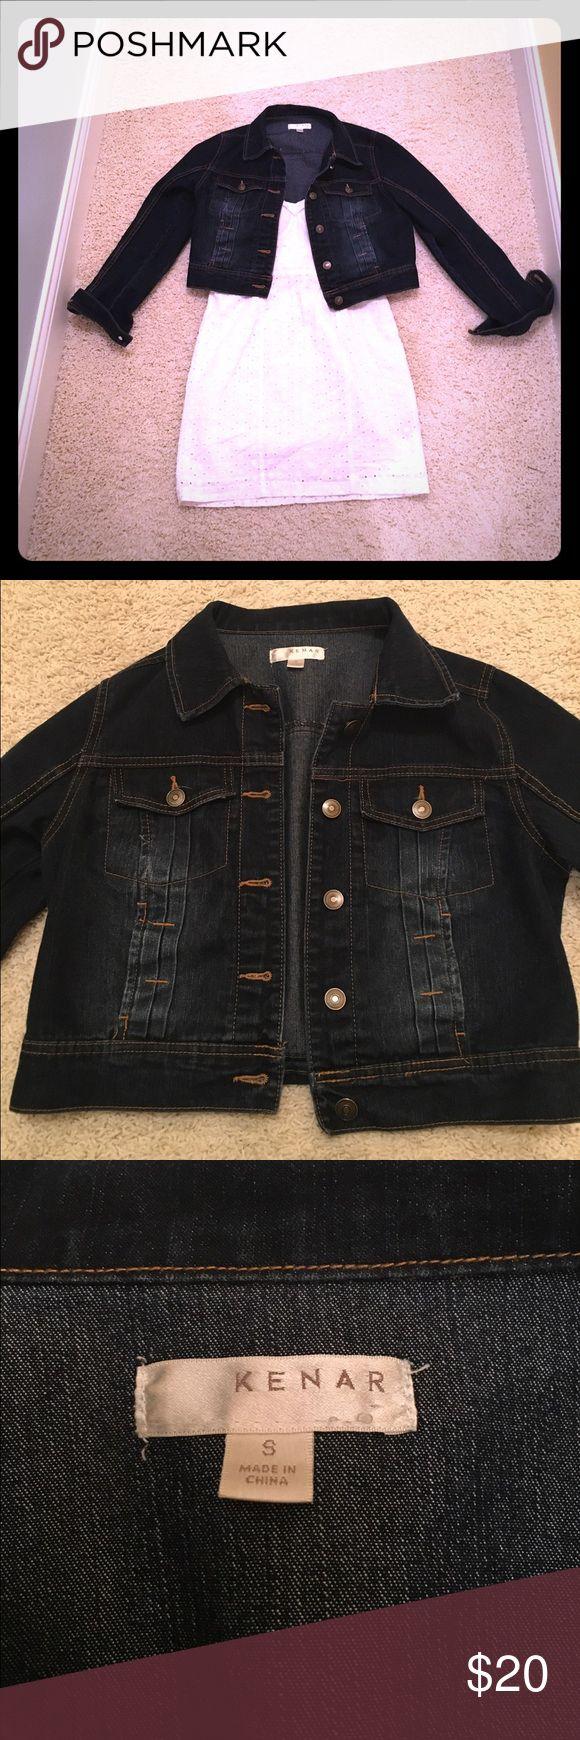 Small waist length dark denim jacket Adorable waist length dark denim jacket perfect to pair with summer sundresses  Jackets & Coats Jean Jackets